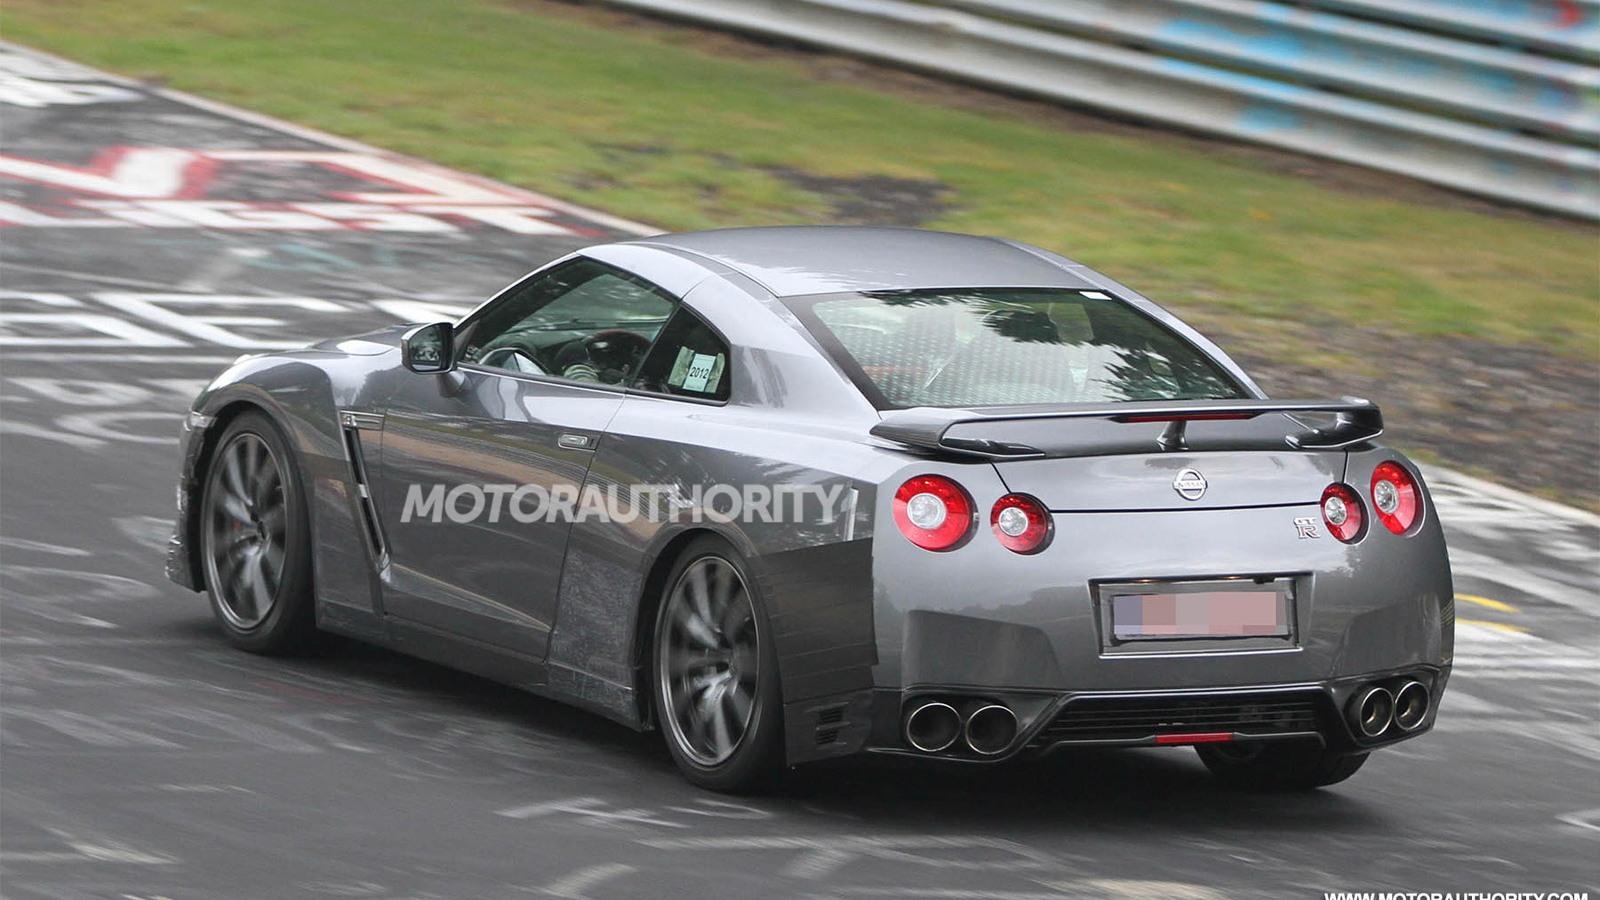 2014 Nissan GT-R spy shots